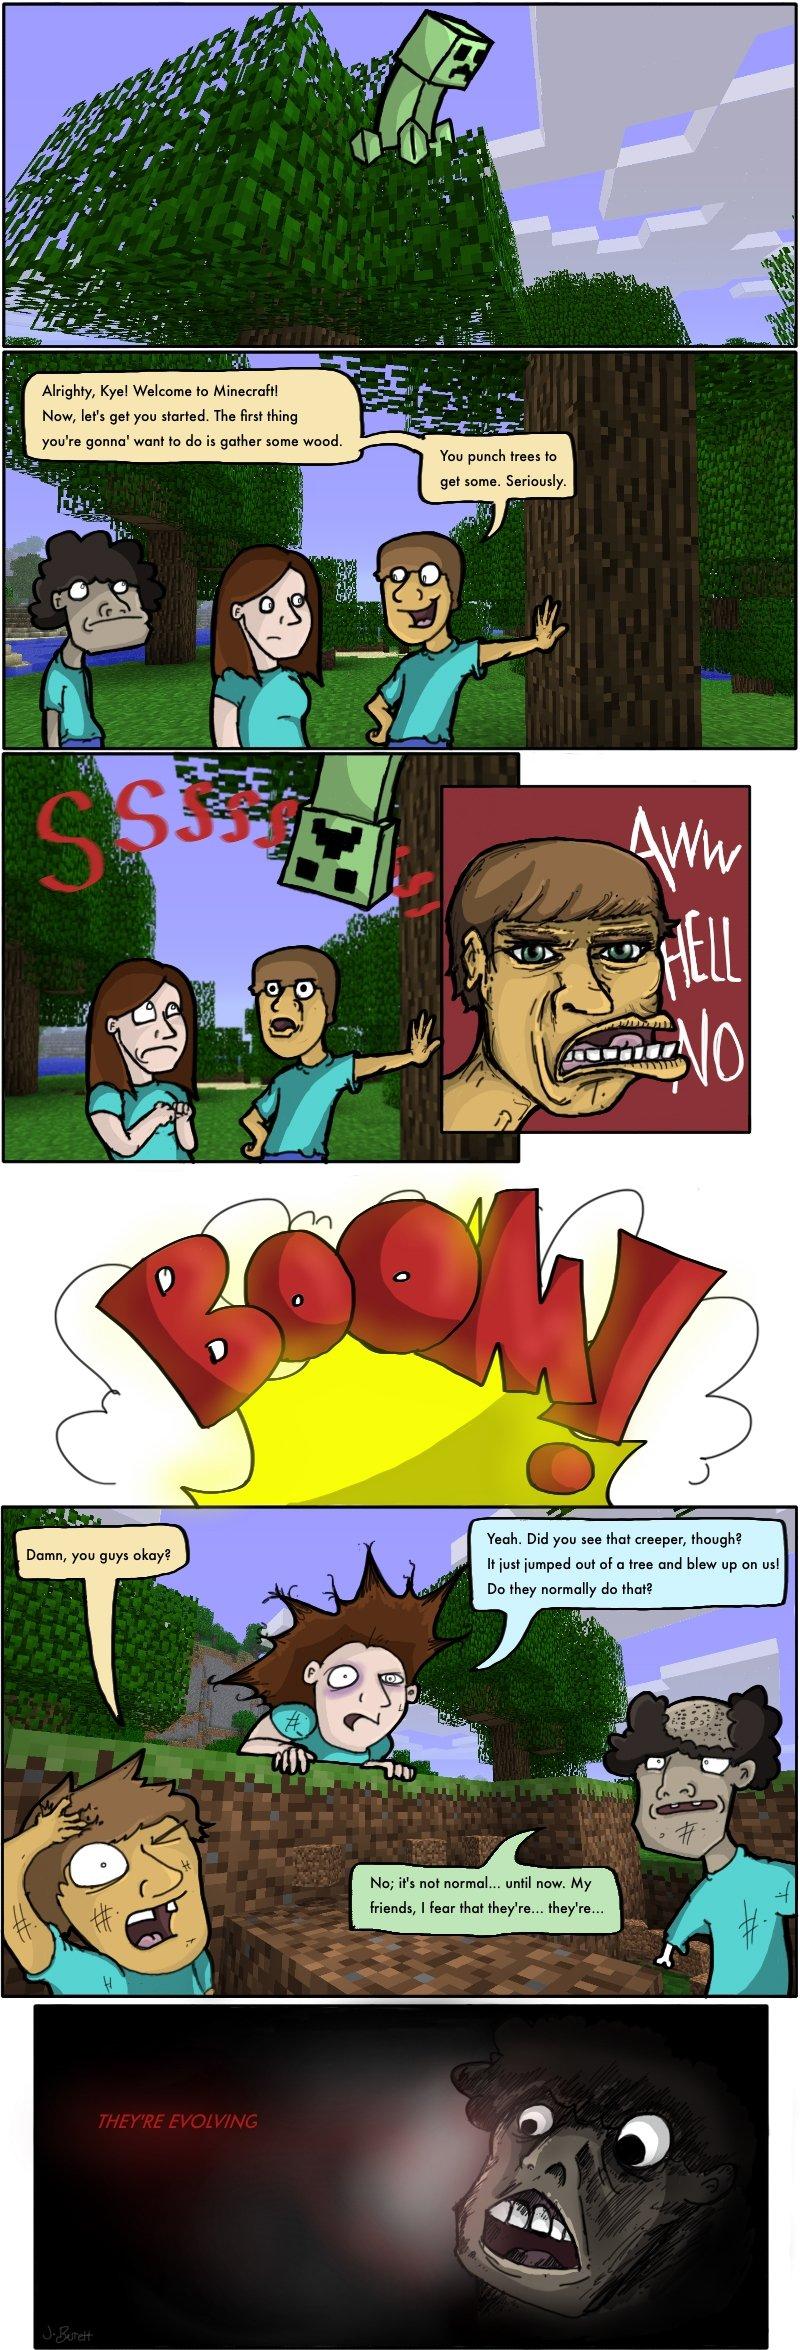 http://img.niceminecraft.net/Funny/Minecraft-Comic-6.jpeg